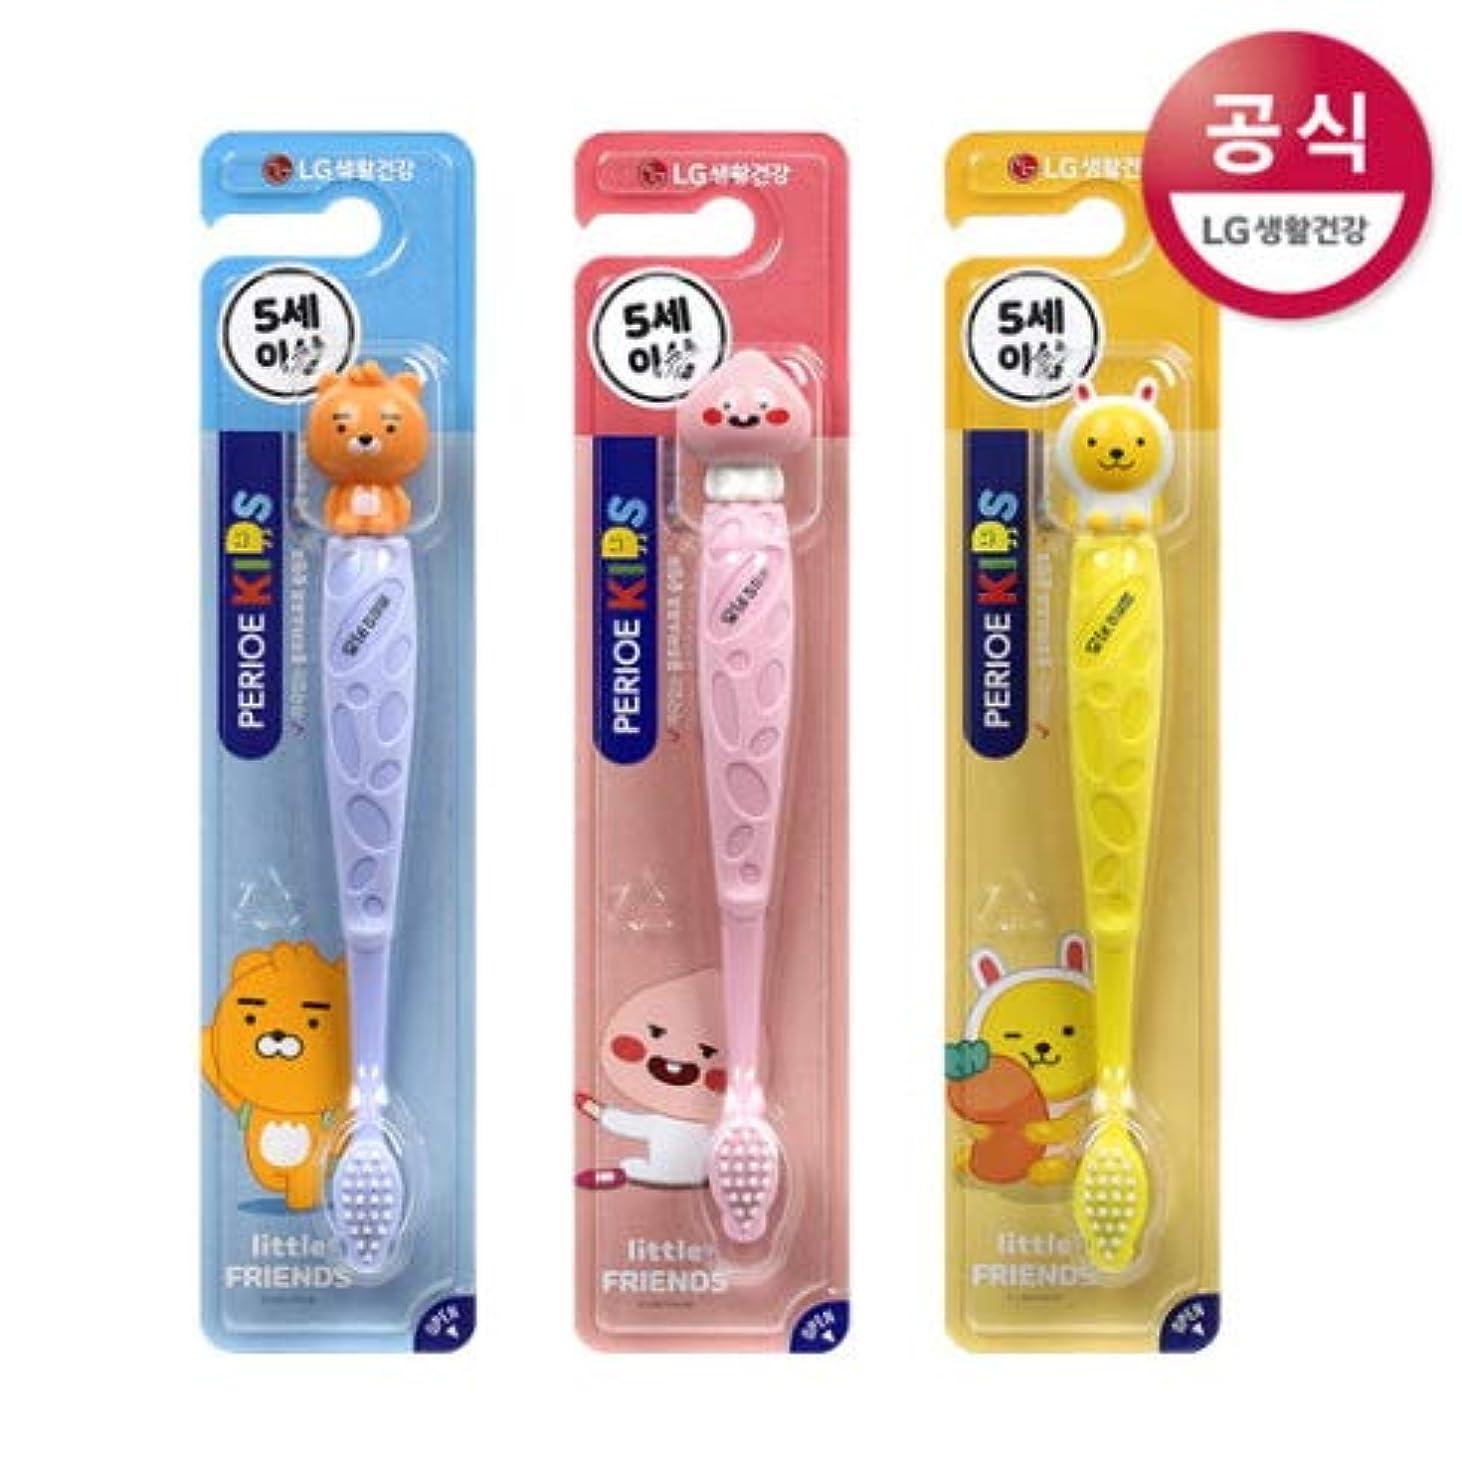 [LG HnB] Pero Kids Cocoa Figure Toothbrush/ペリオ子供カカオフィギュア歯ブラシ 1口x3個(海外直送品)